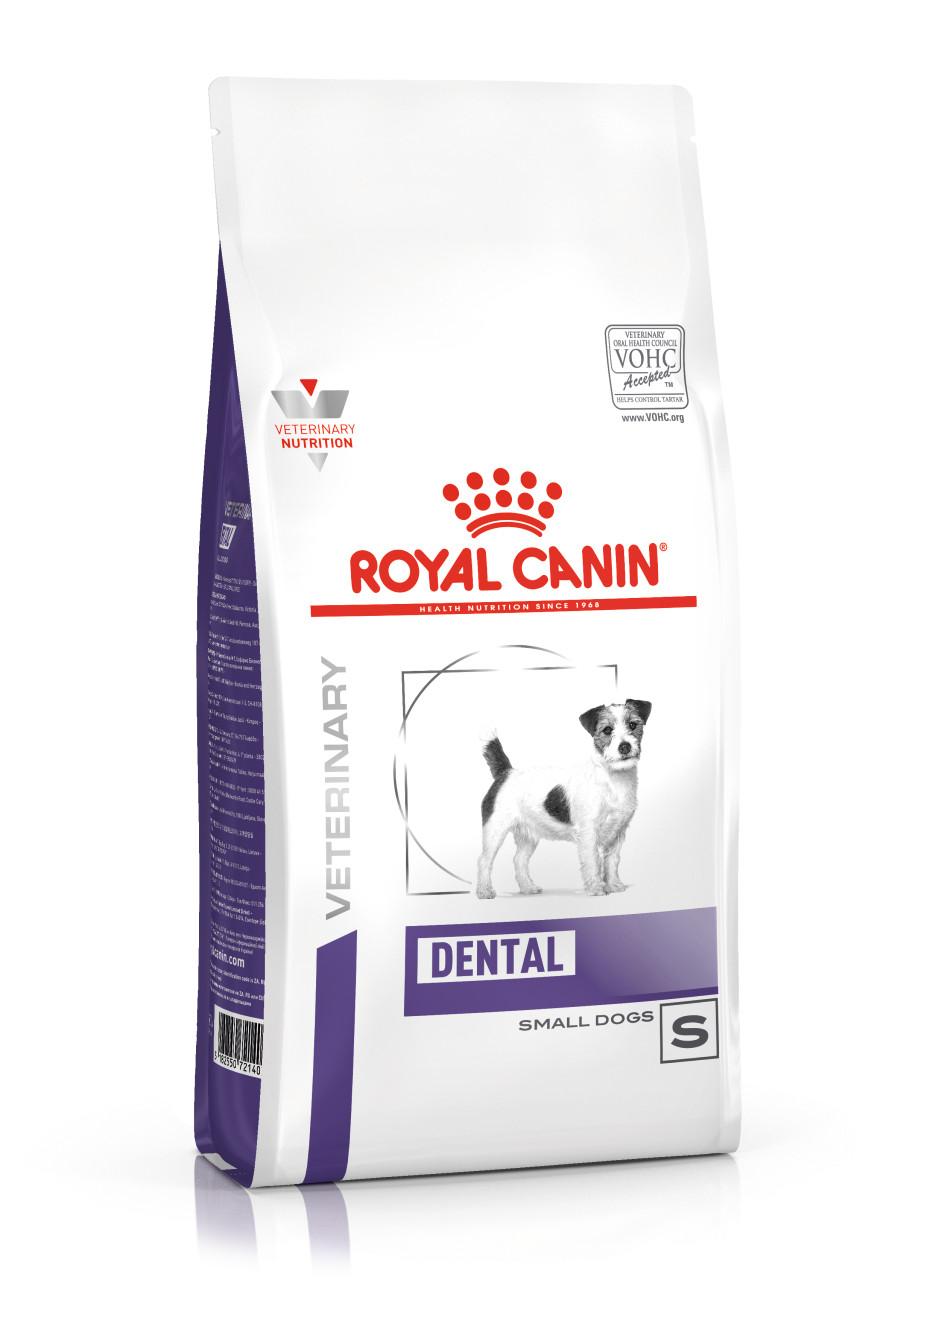 Royal Canin Veterinary Dental Small Dogs hondenvoer